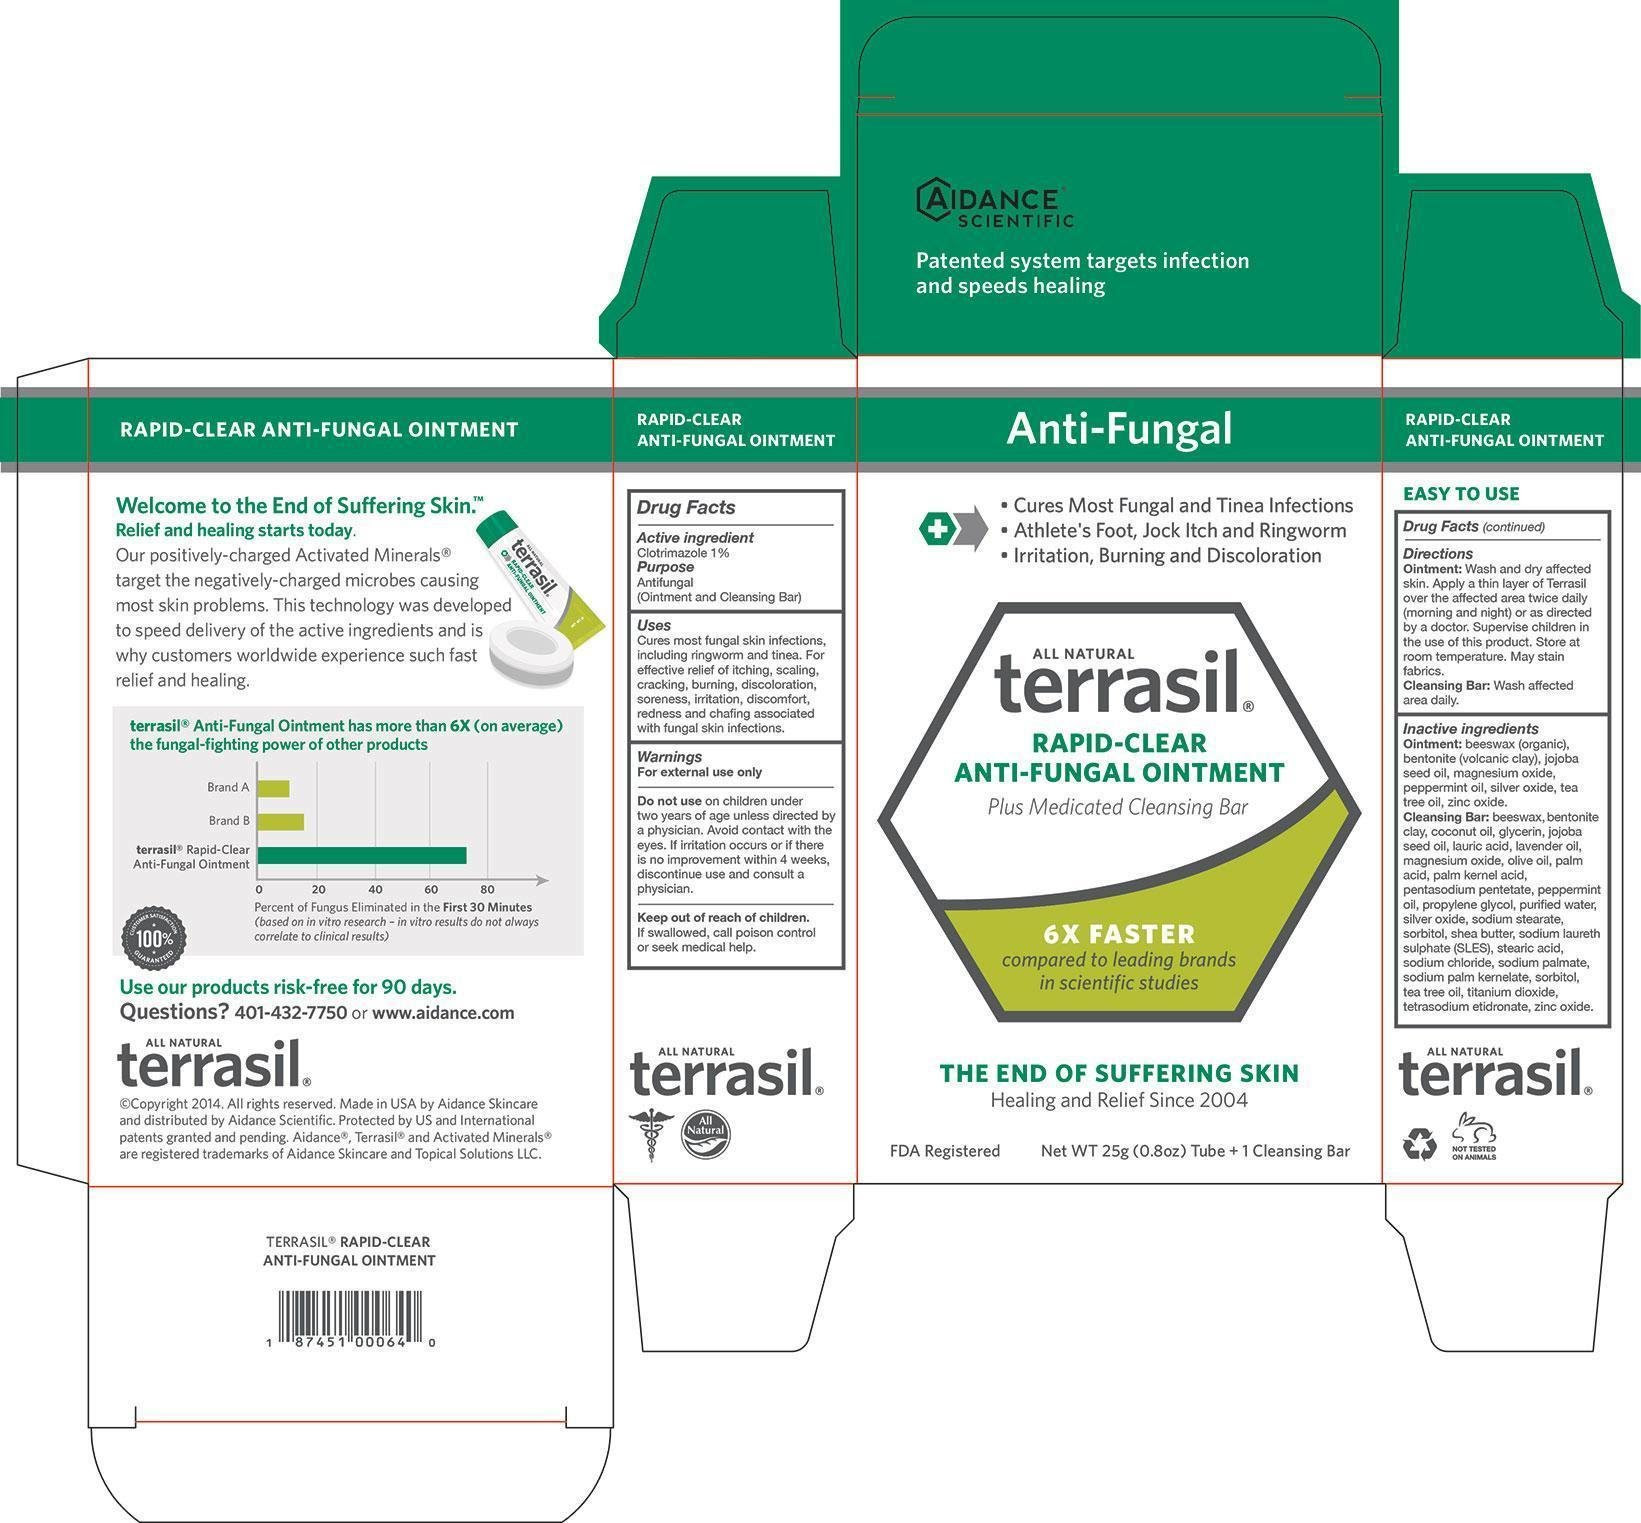 Terrasil Rapid-Clear Anti-Fungal (Aidance Skincare ...